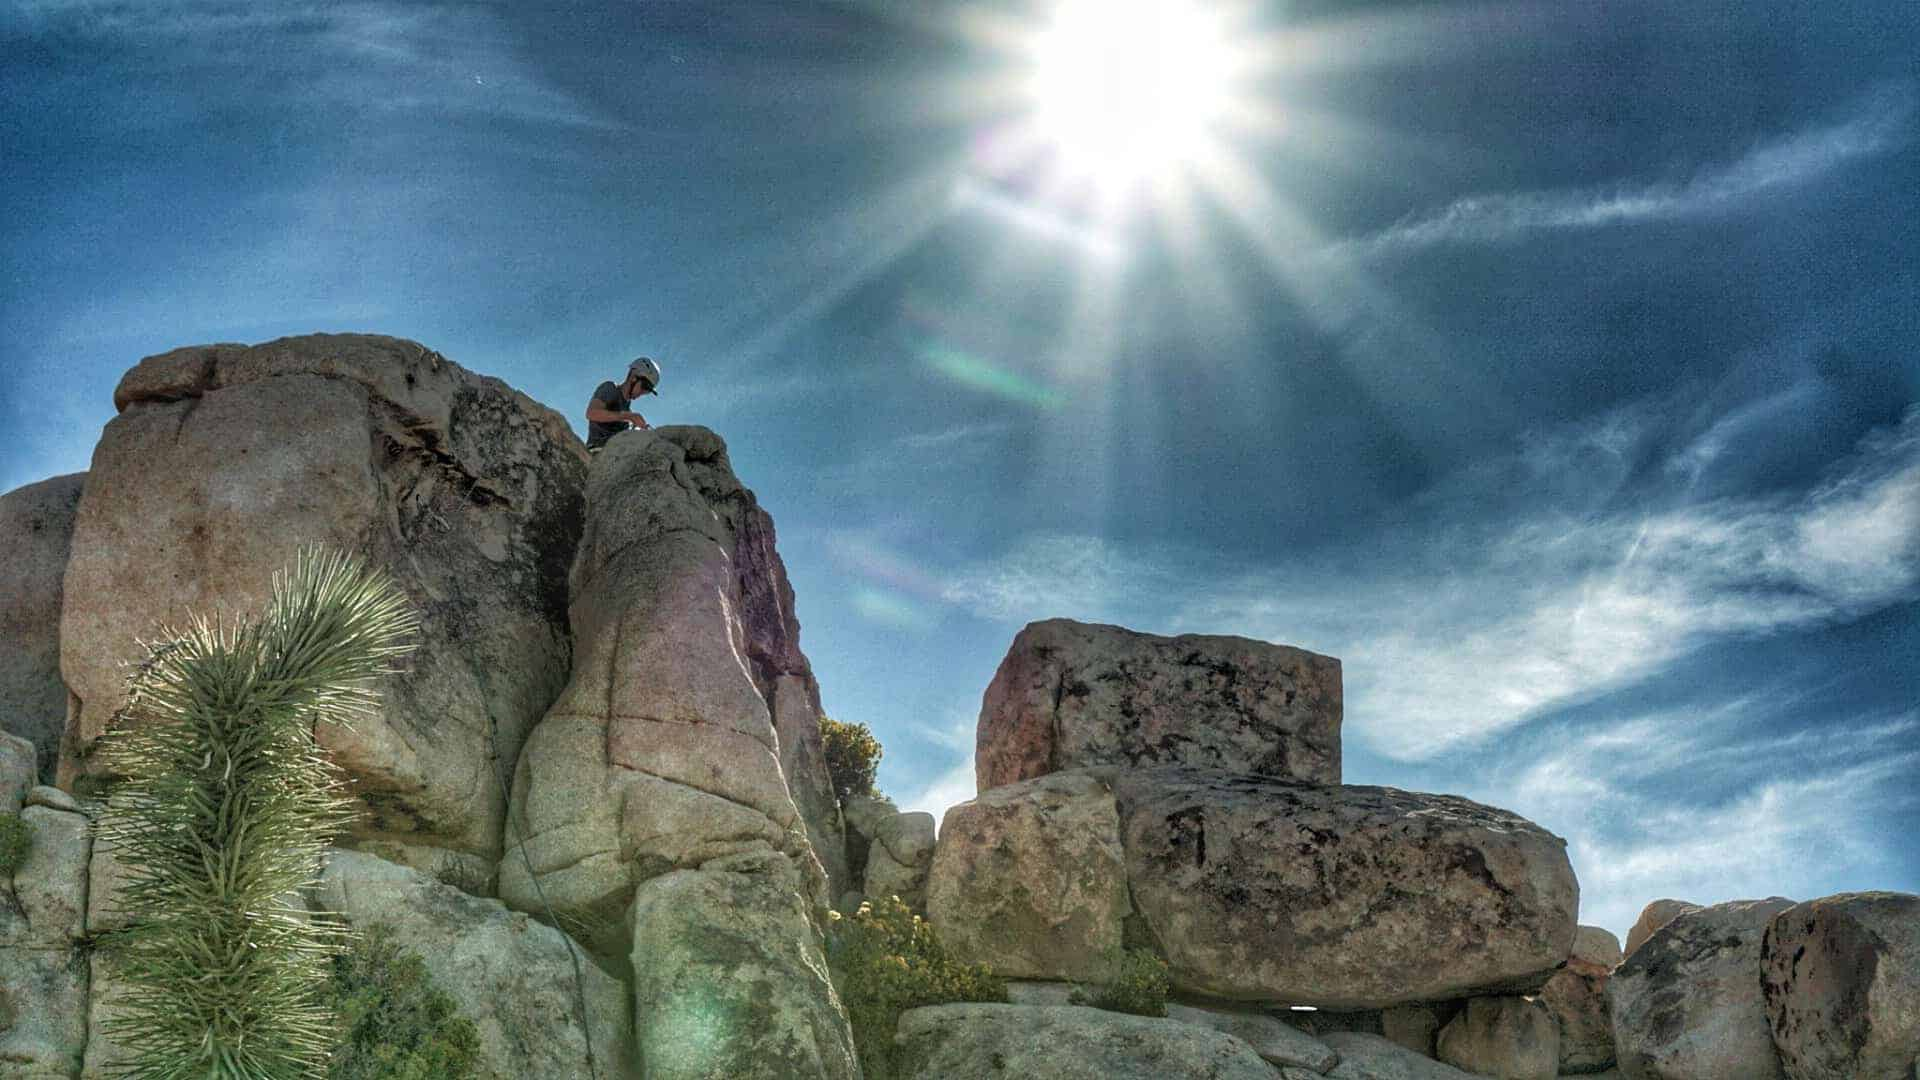 Best-Beginner-Climbs-in-Joshua-Tree-10